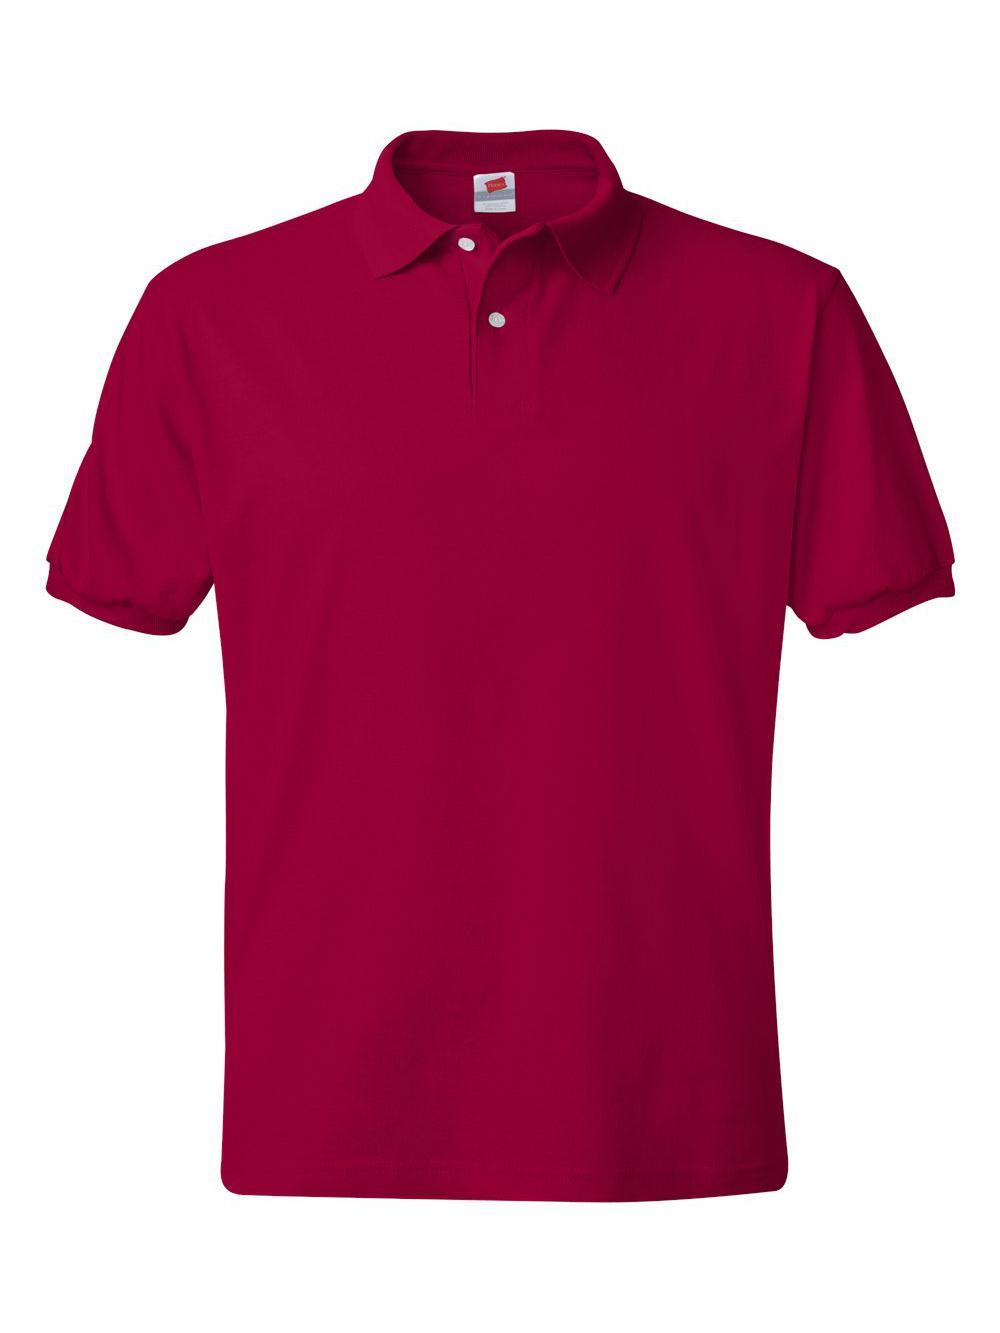 Hanes-Ecosmart-Jersey-Sport-Shirt-054X thumbnail 15